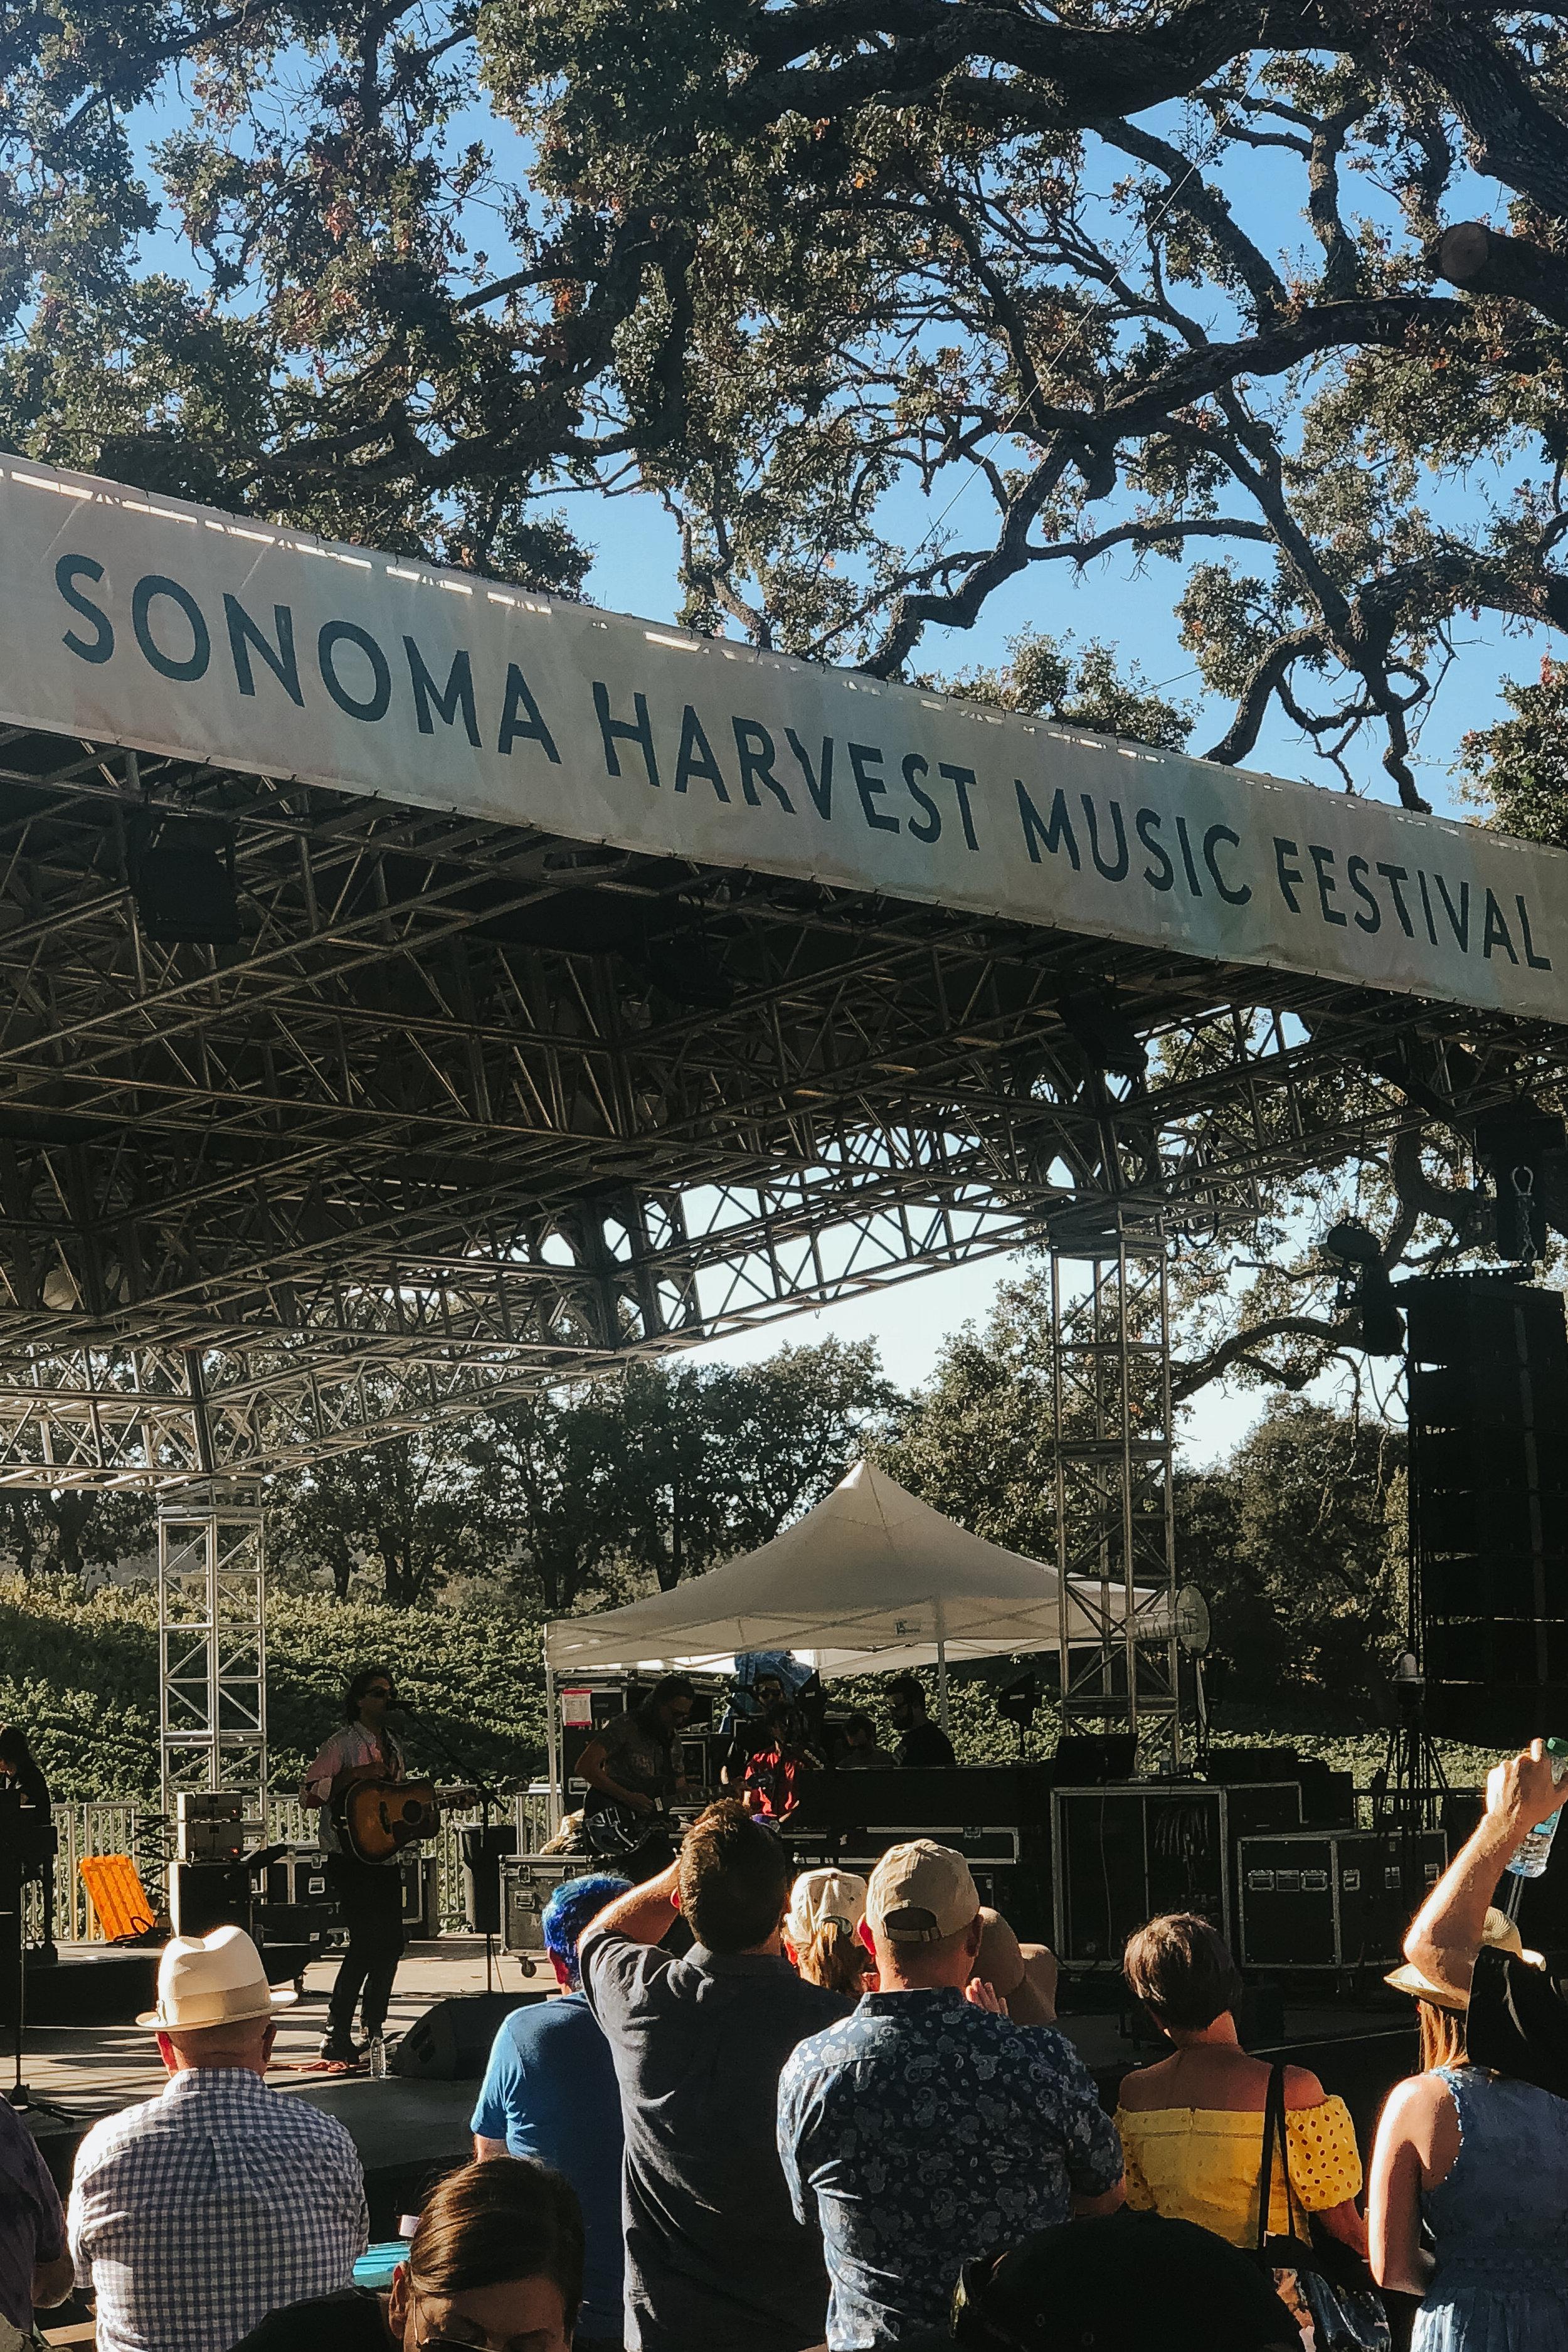 Sonoma Harvest Music Festival via. Birdie Shoots   www.birdieshoots.com